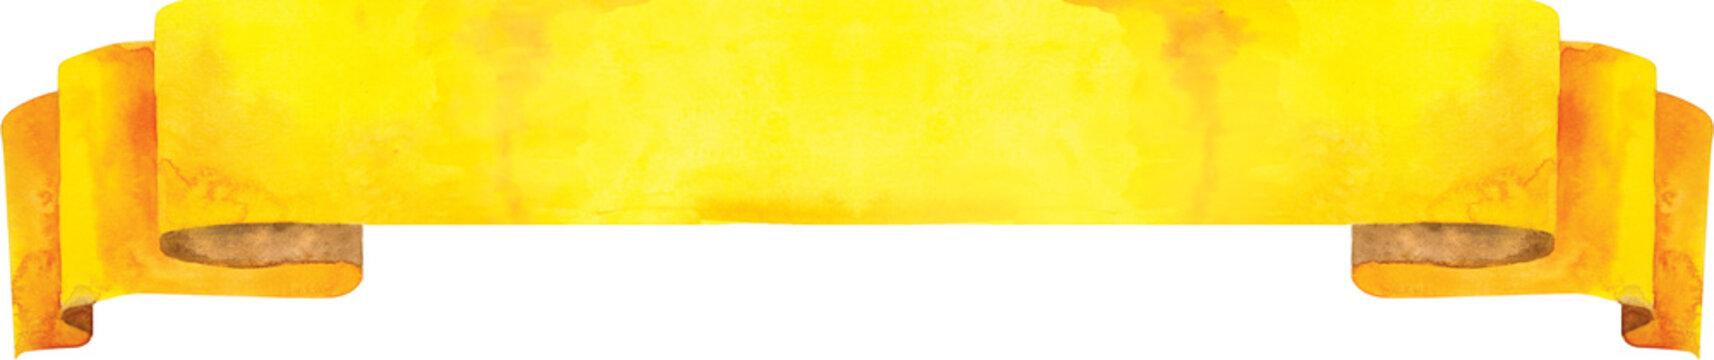 Watercolor yellow banner